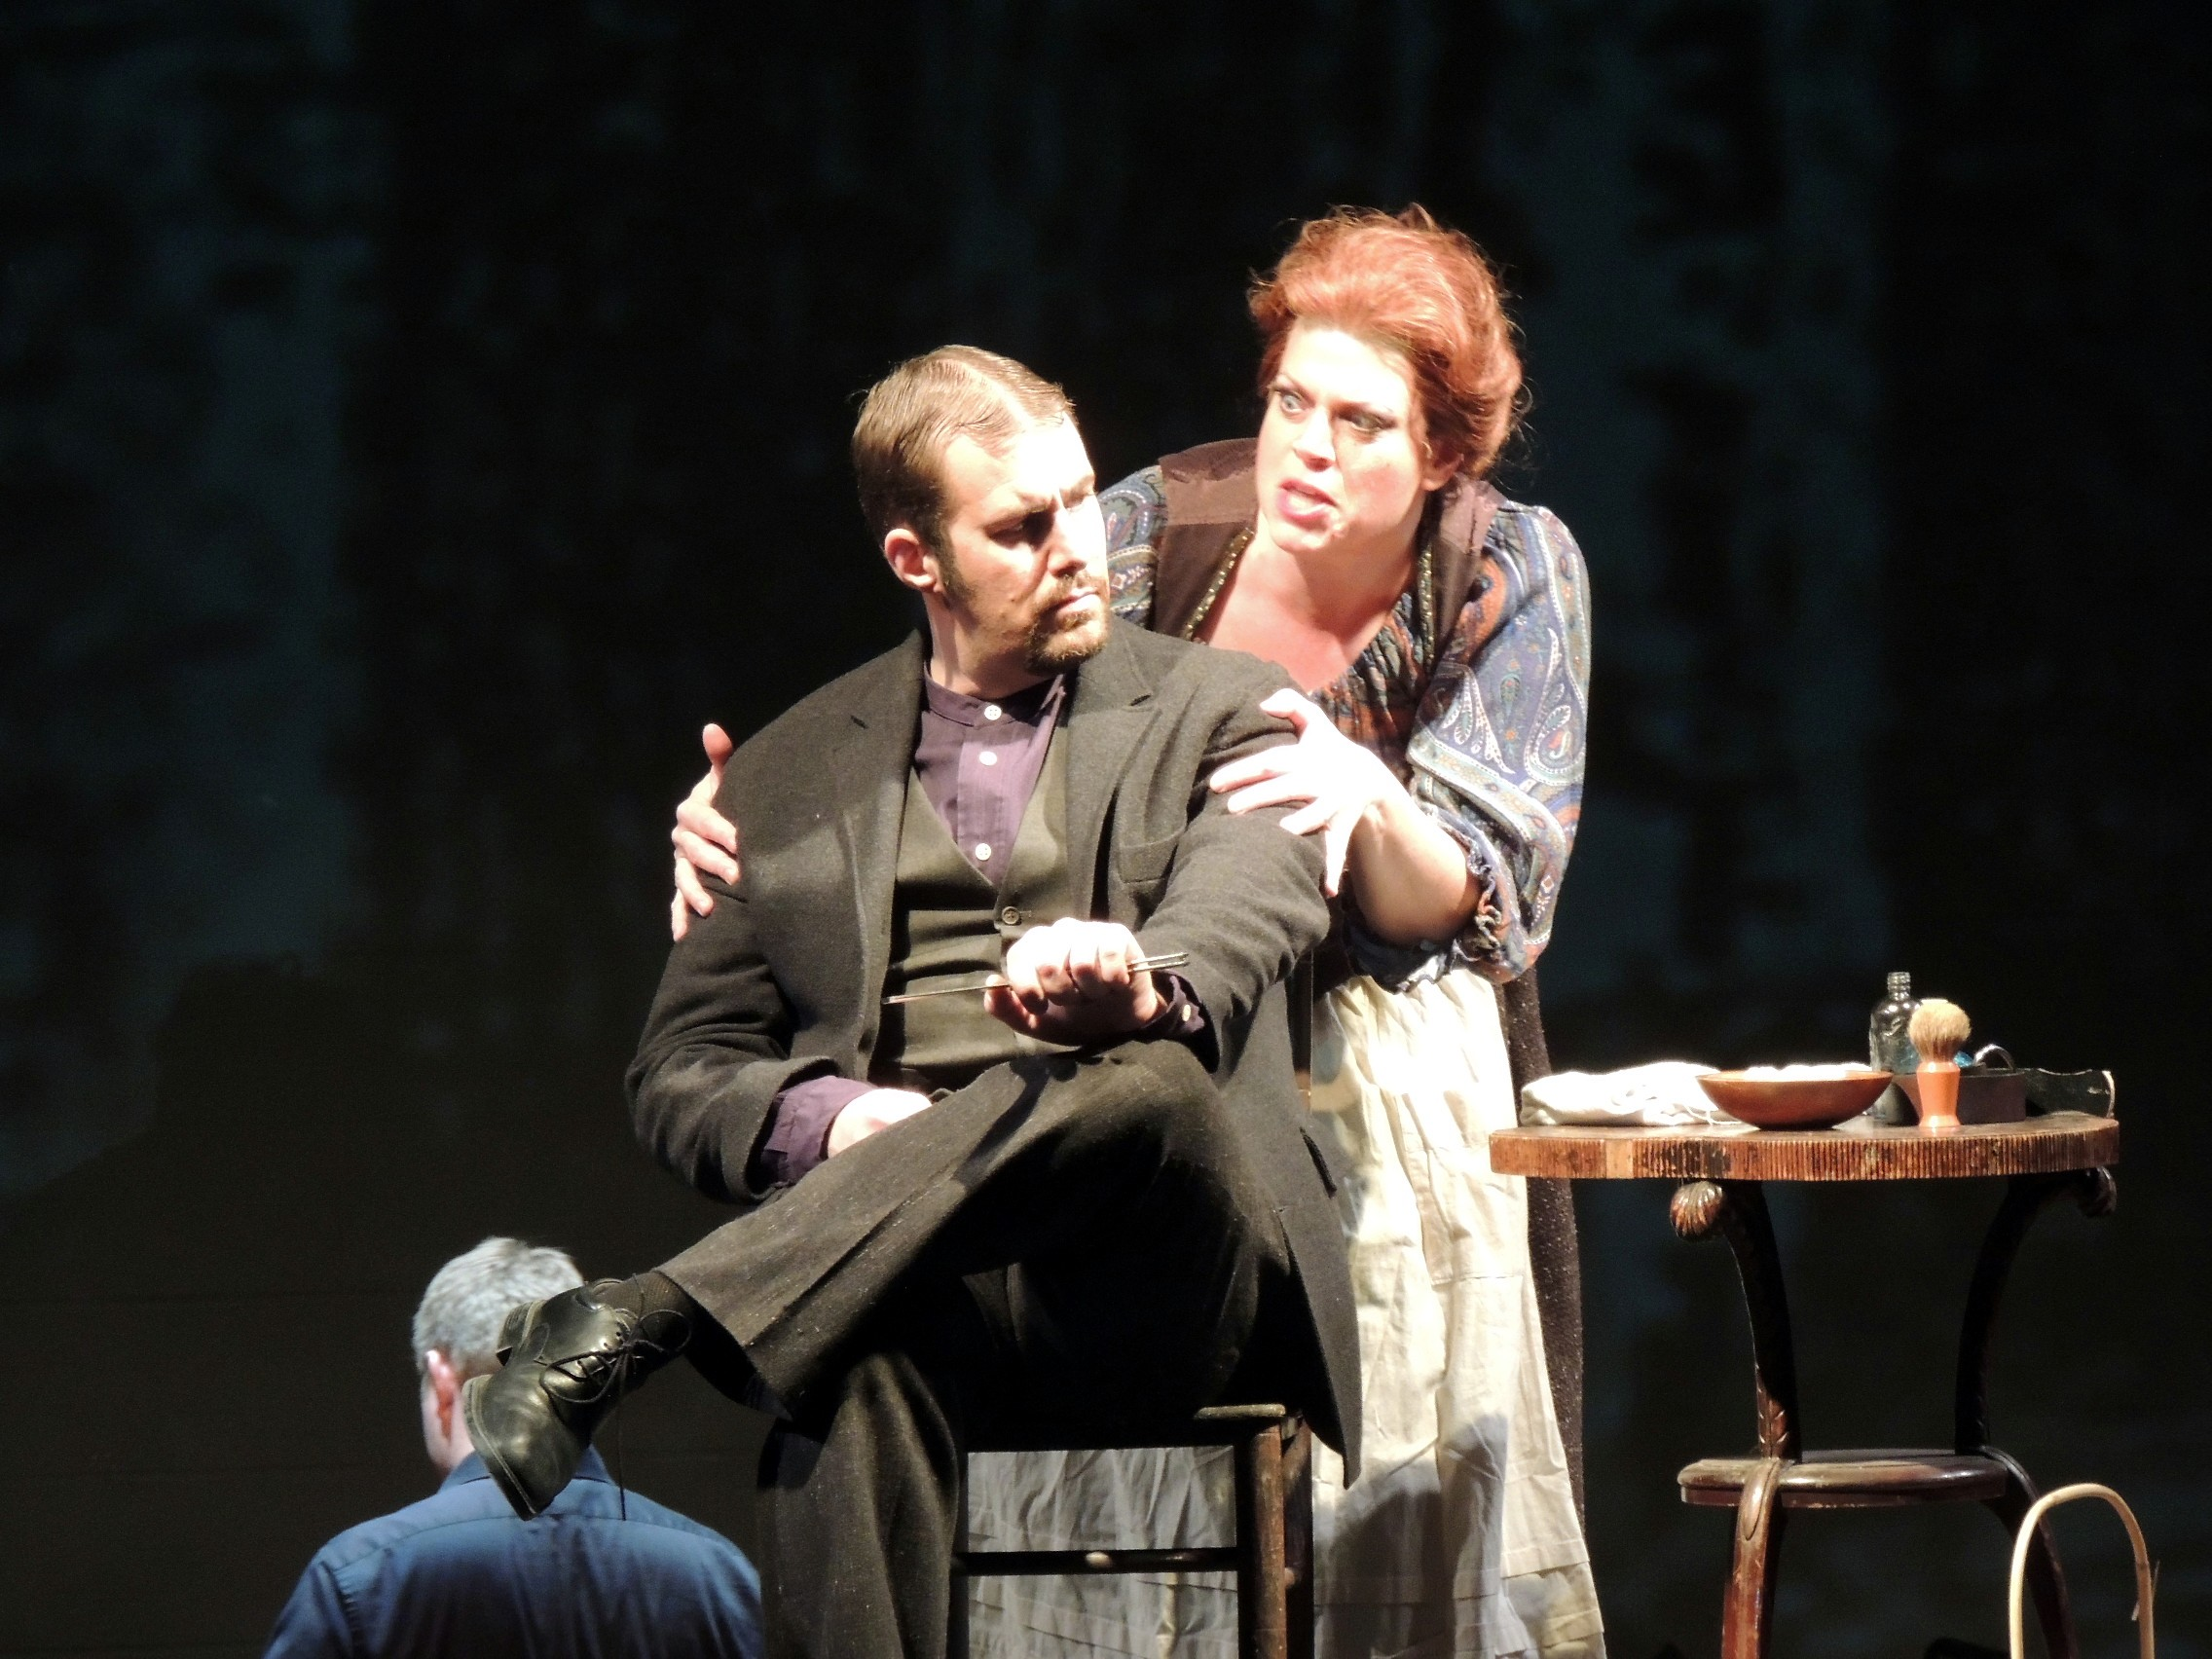 Mrs. Lovett (Jennifer Roderer) comforts the vengeance driven Todd (Kyle Albertson). Photo: Syracuse Opera